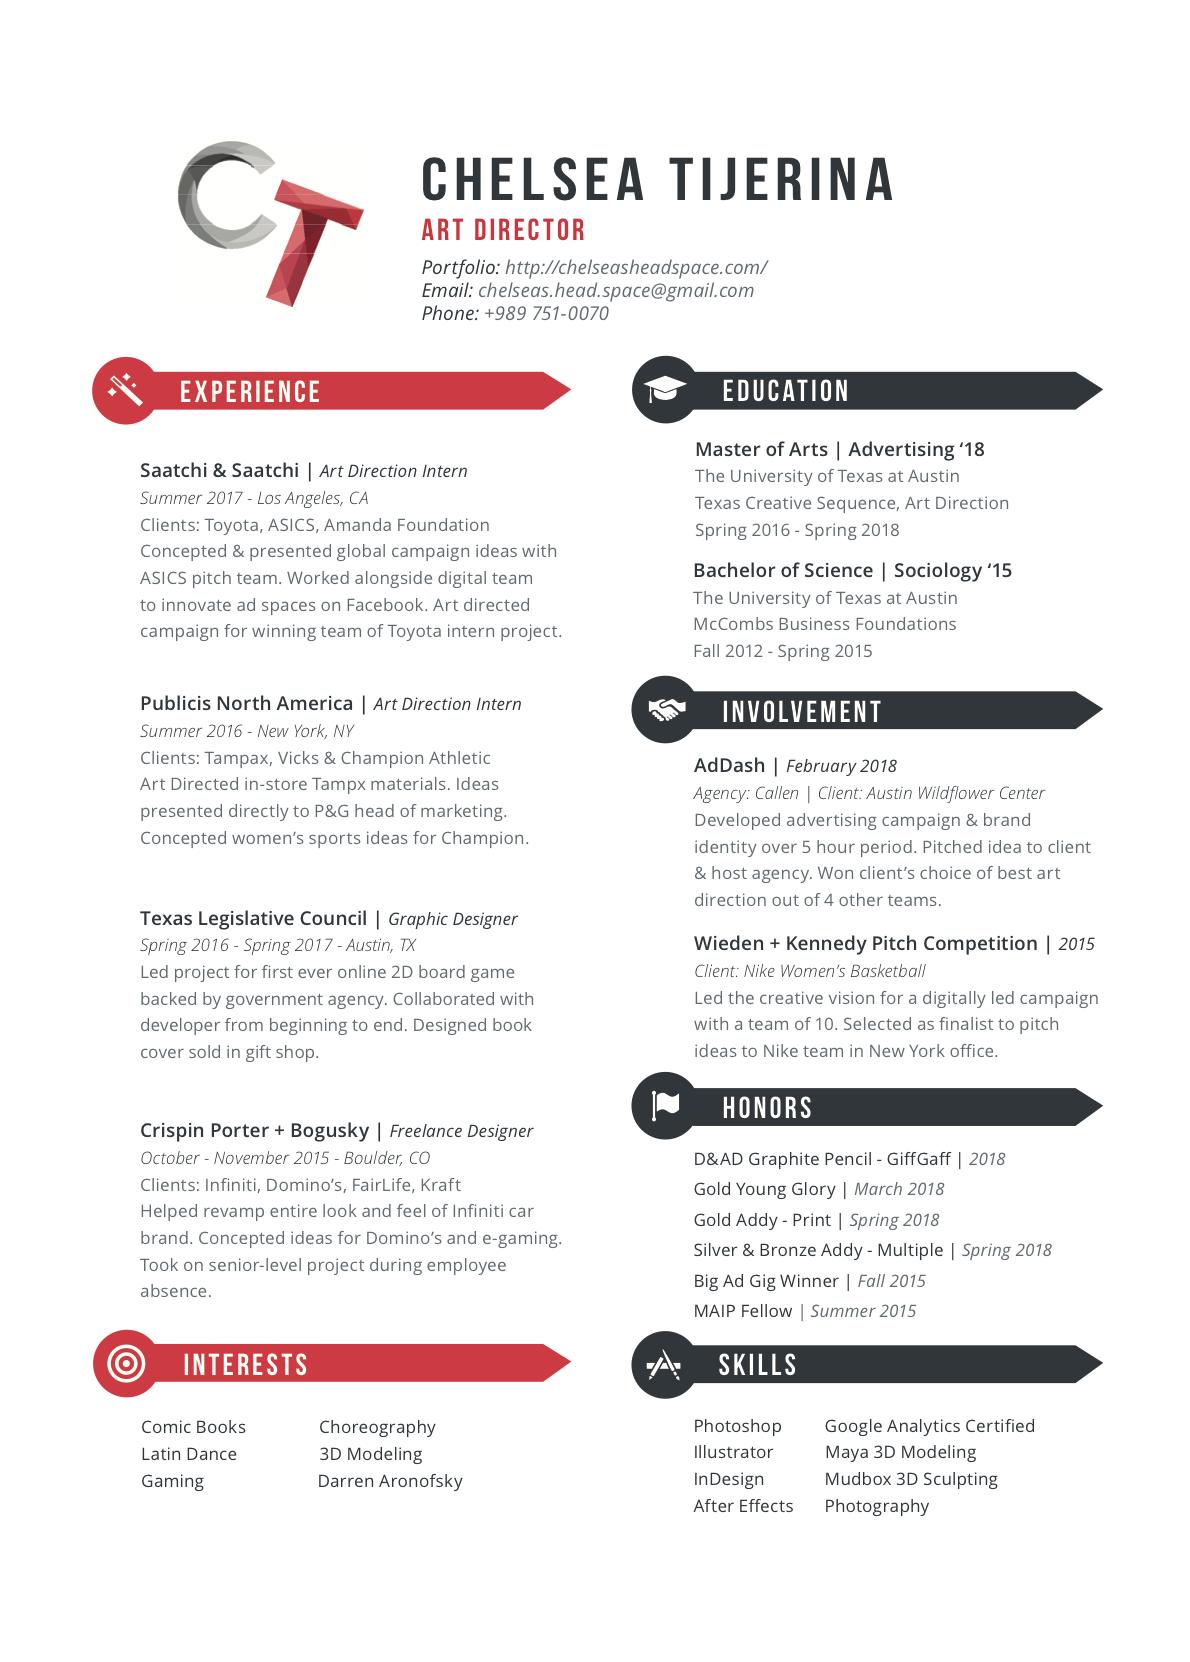 chelsea tijerina resume